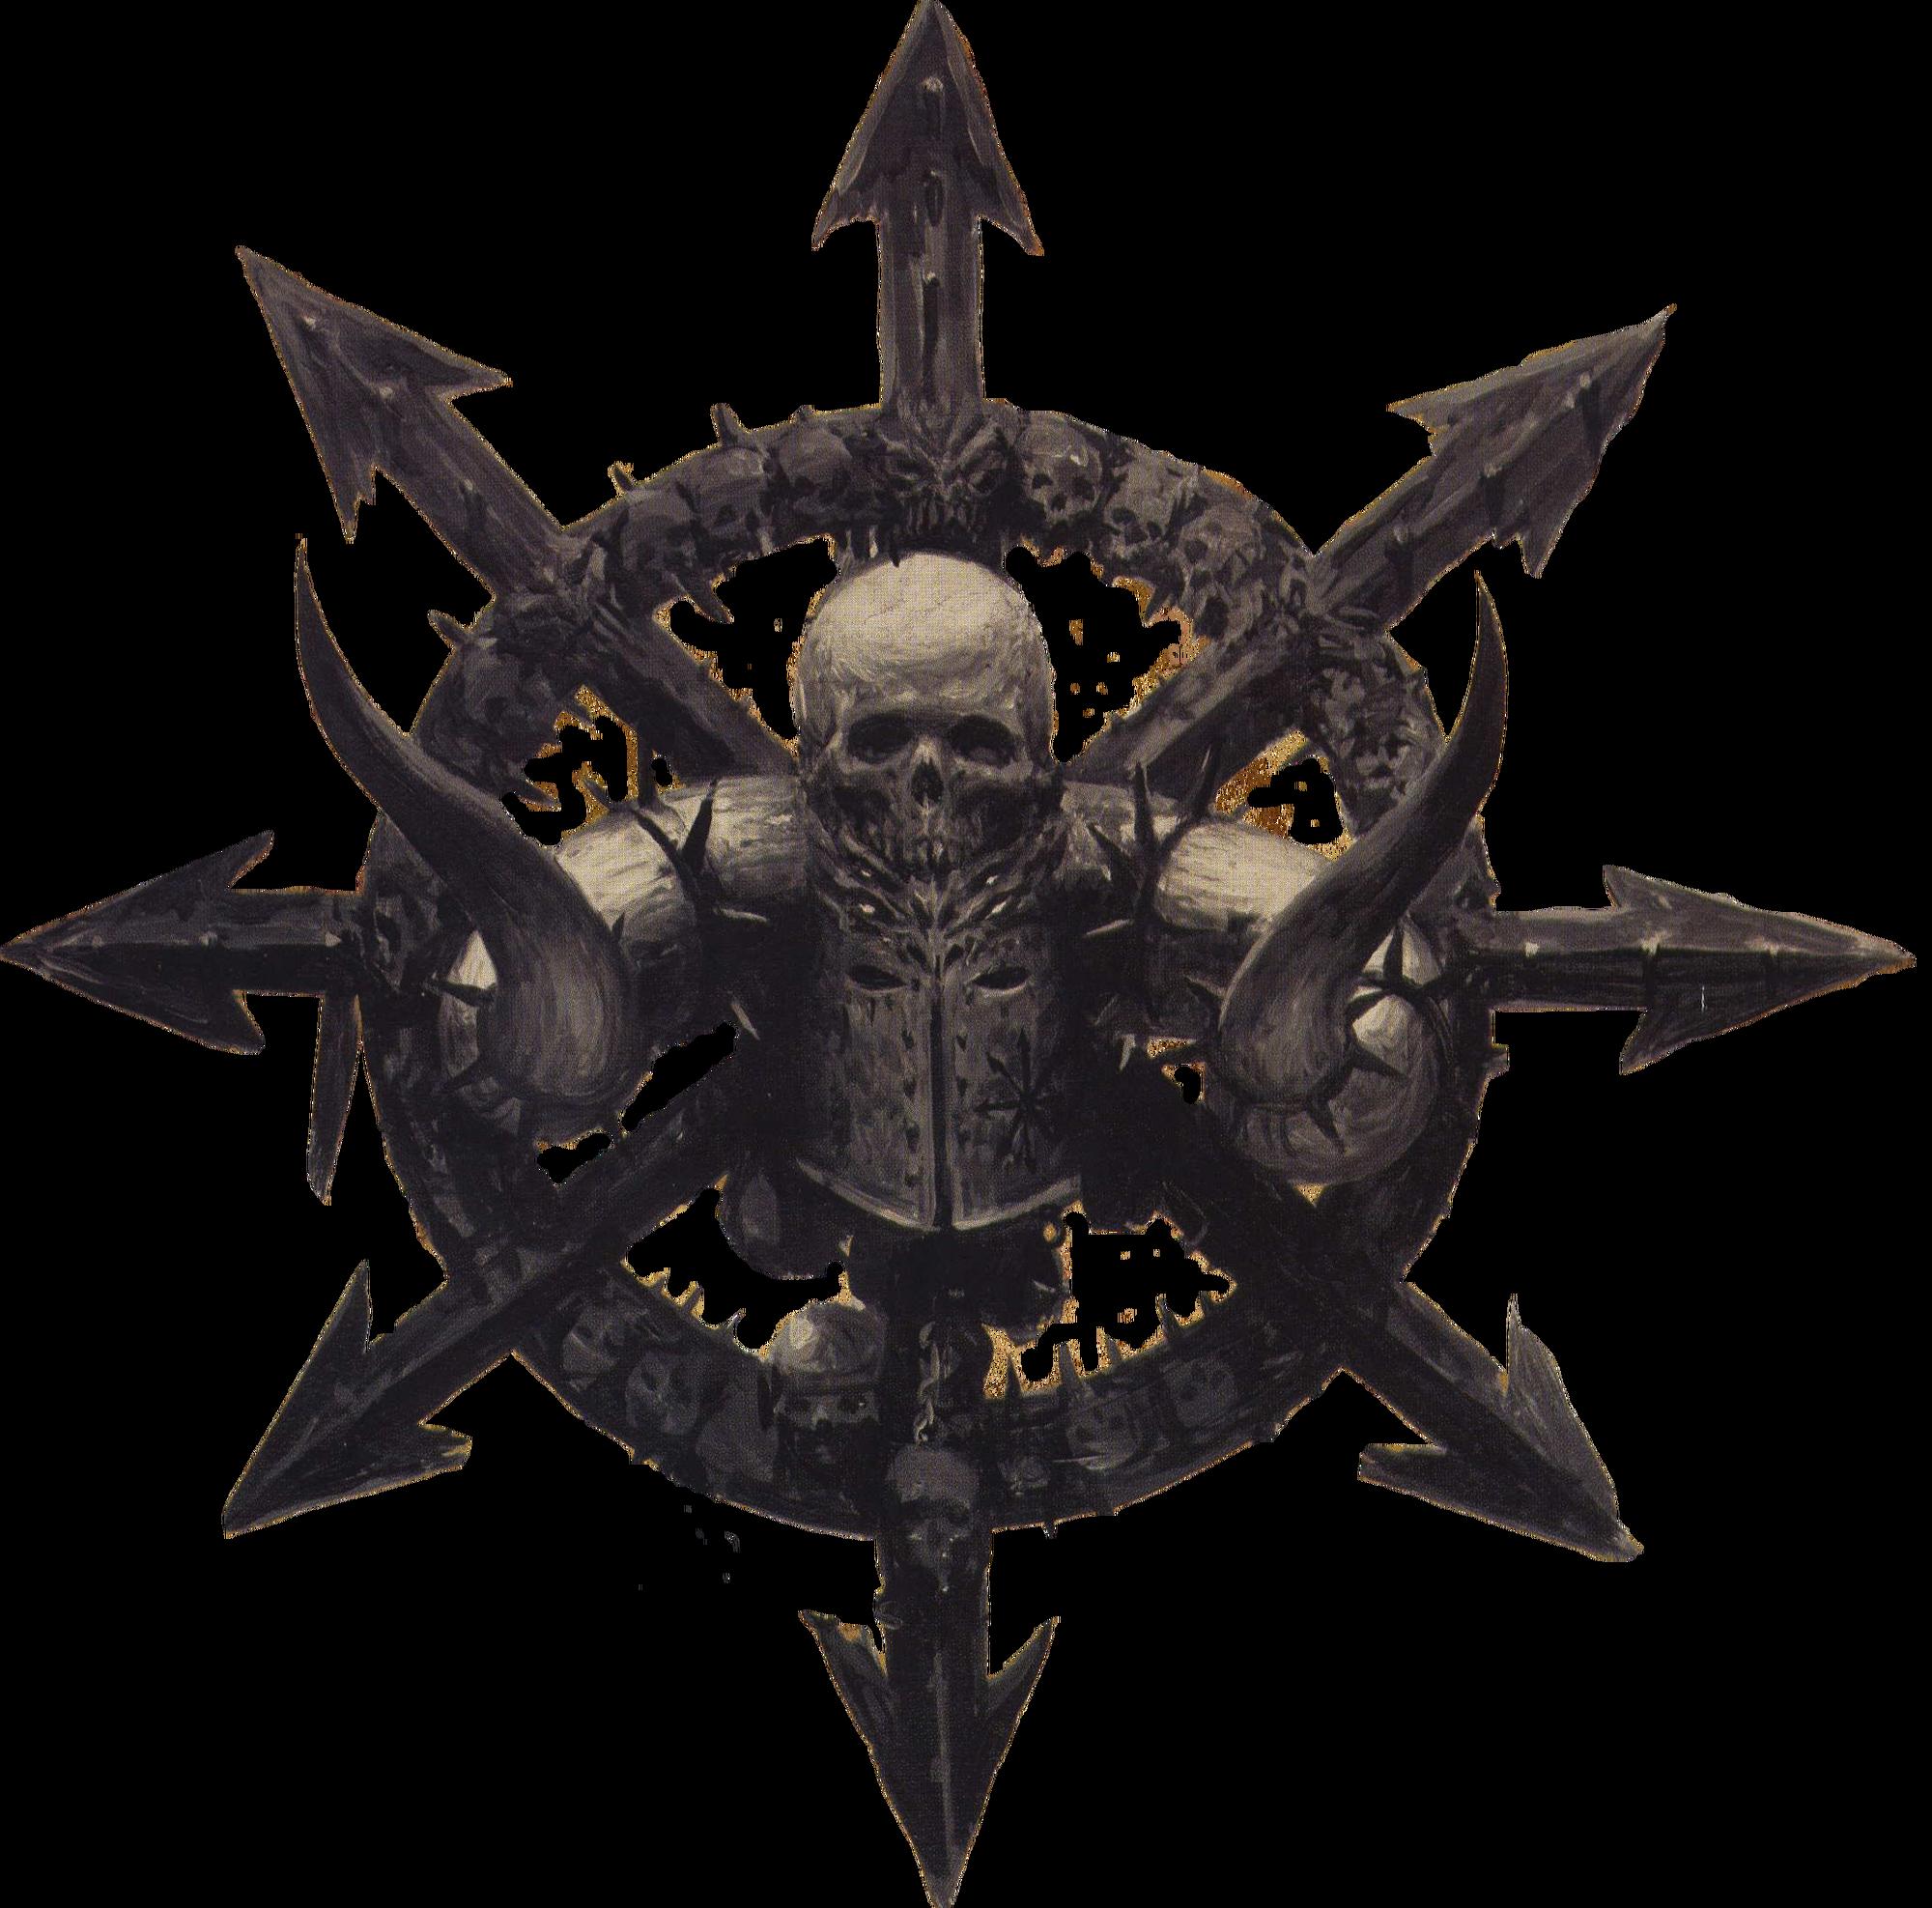 warriors of chaos warhammer wiki fandom powered by wikia